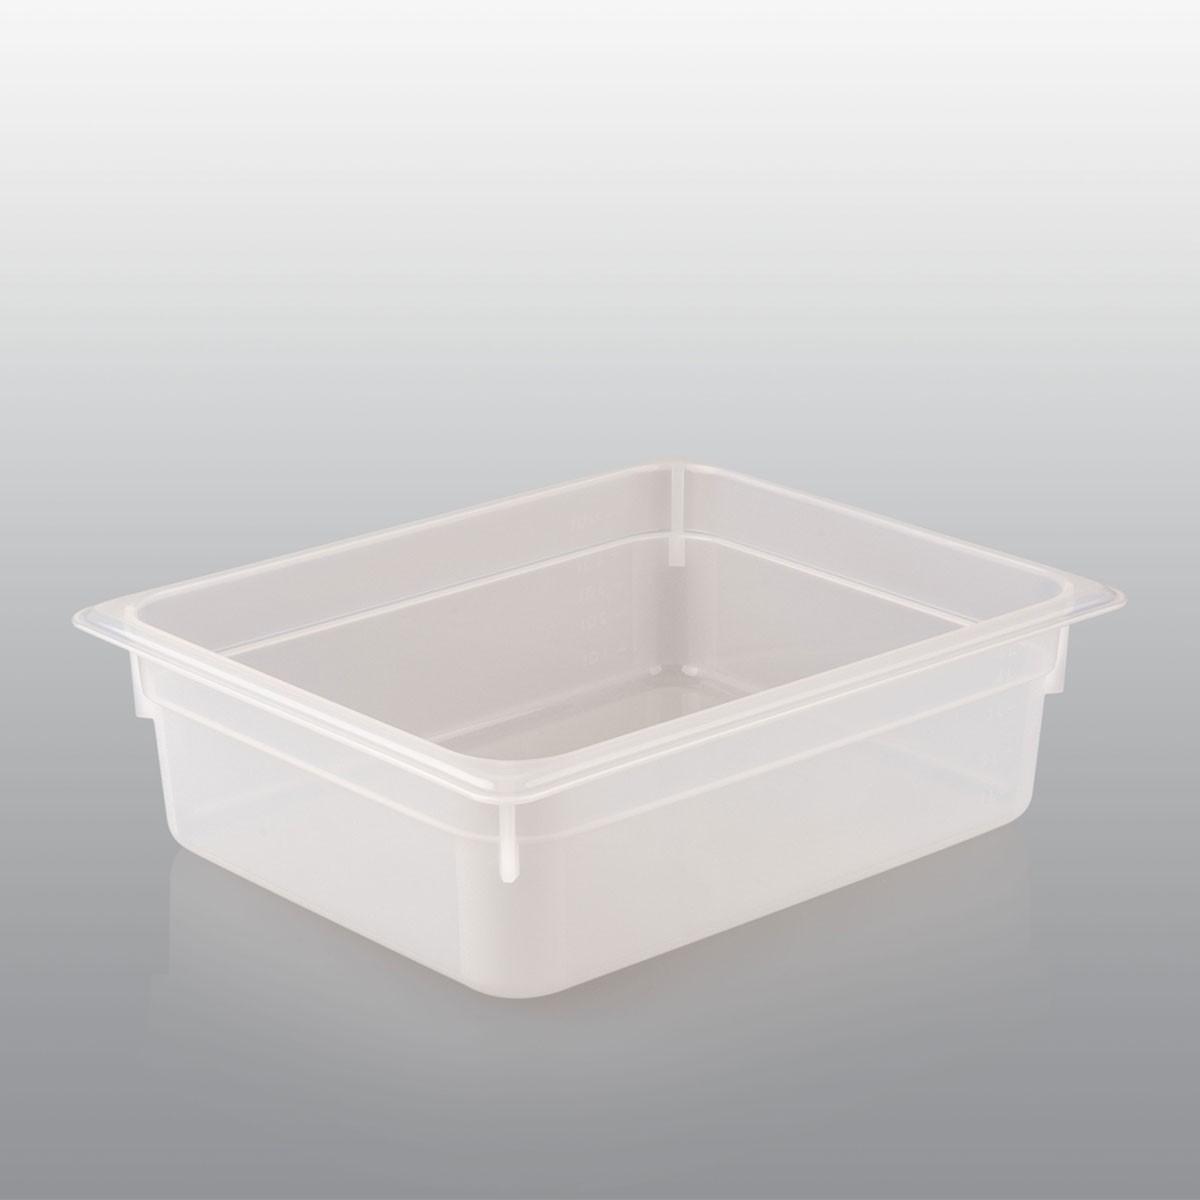 GN Behälter GN 1/2 aus Polypropylen (Tiefe: 65mm) 4,0 L Saro